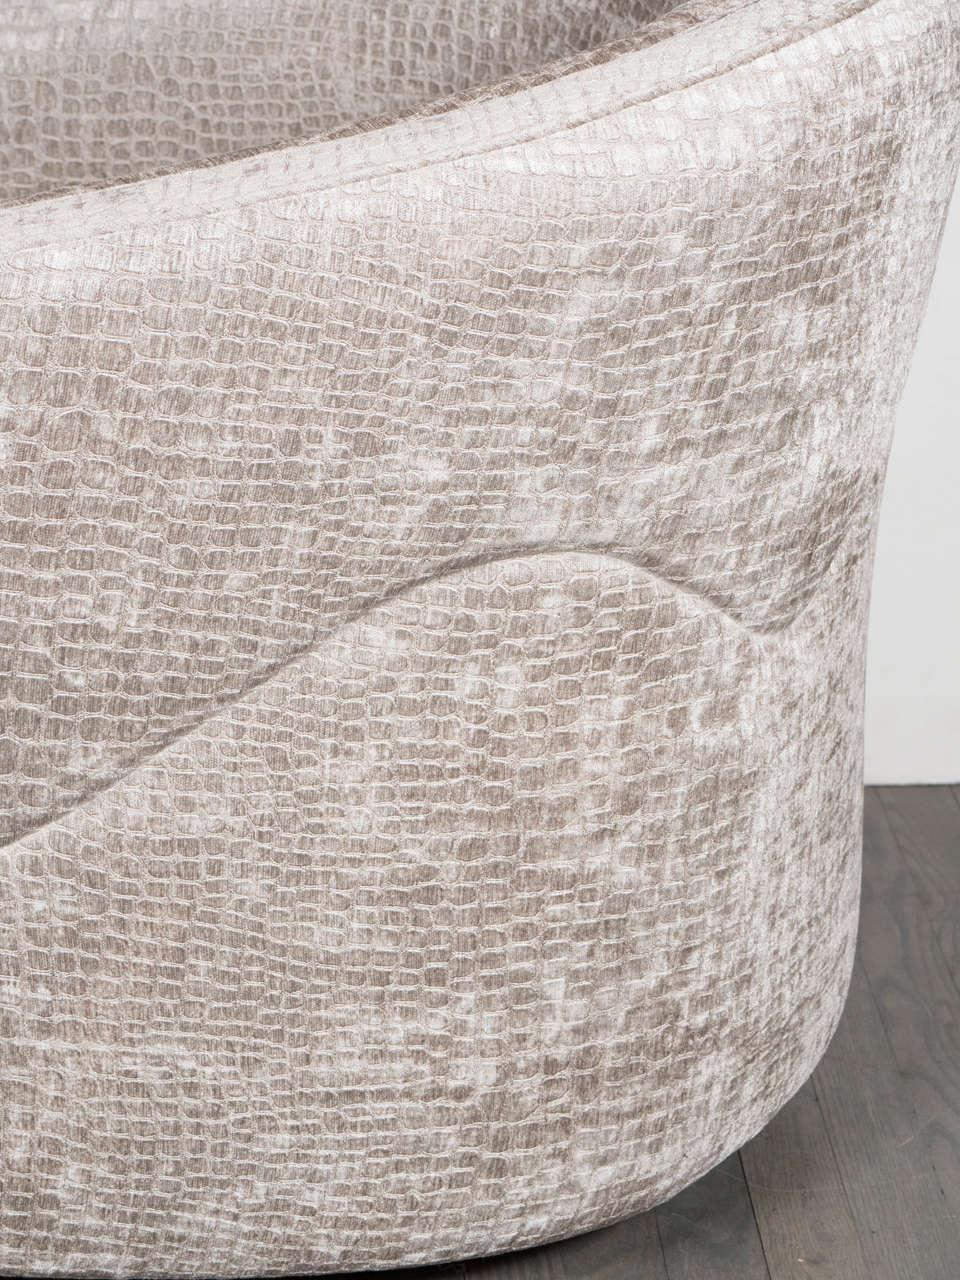 Late 20th Century Mid-Century Modernist Swivel Chair by Milo Baughman in Crocodile Velvet For Sale